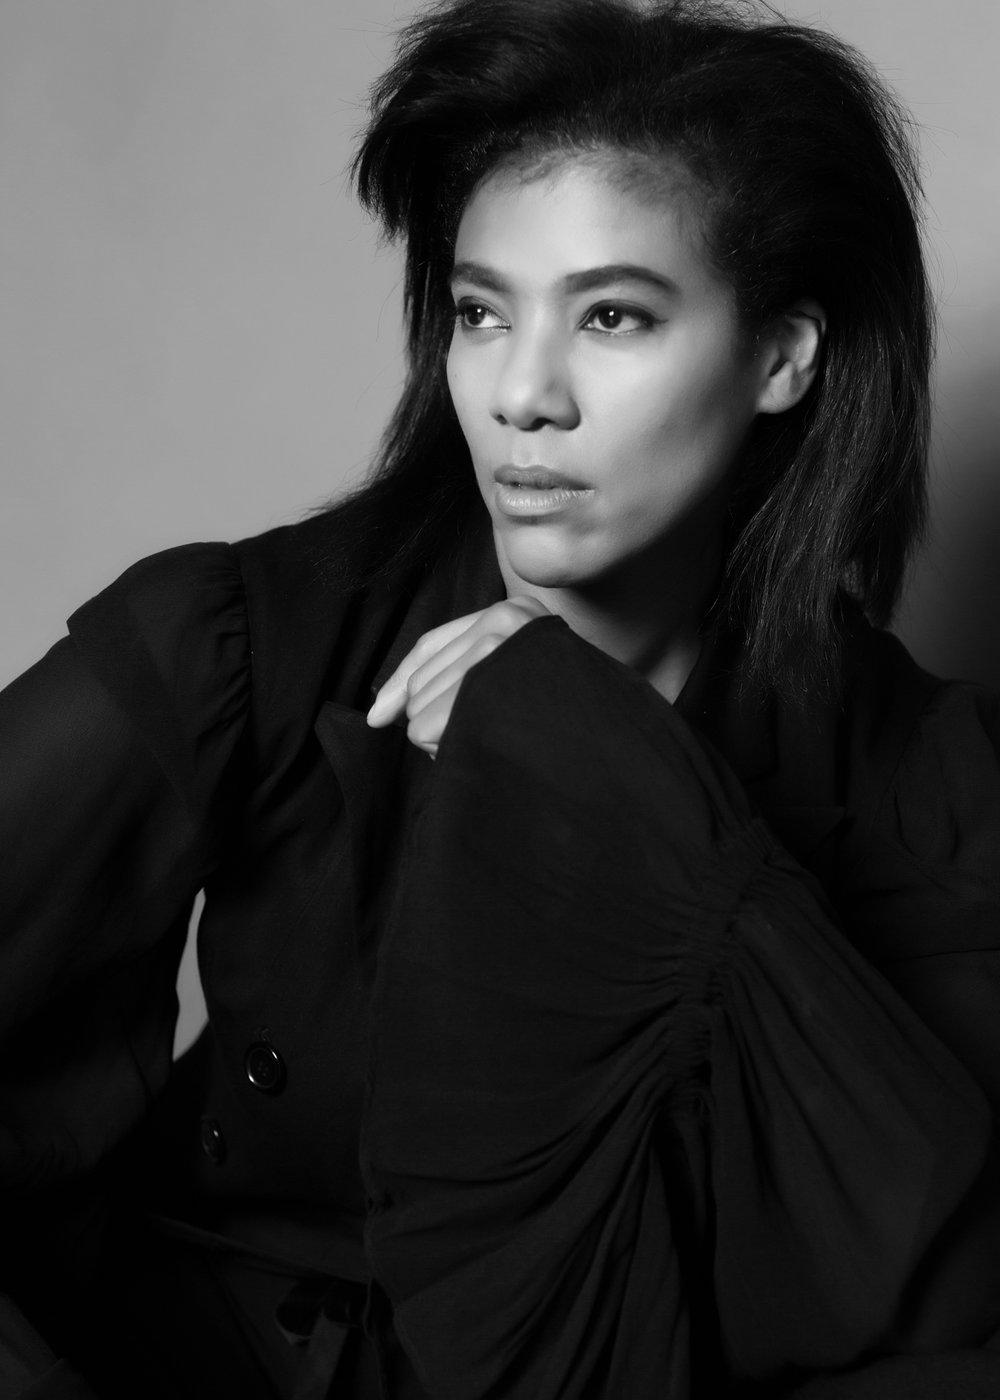 NOIR INDULGENCE - Black and White Classic Portrait Photography         Normal 0     false false false  EN-US JA X-NONE                                                                                                                                                                                                                                                                                                                                                                                                                                                     /* Style Definitions */ table.MsoNormalTable {mso-style-name: